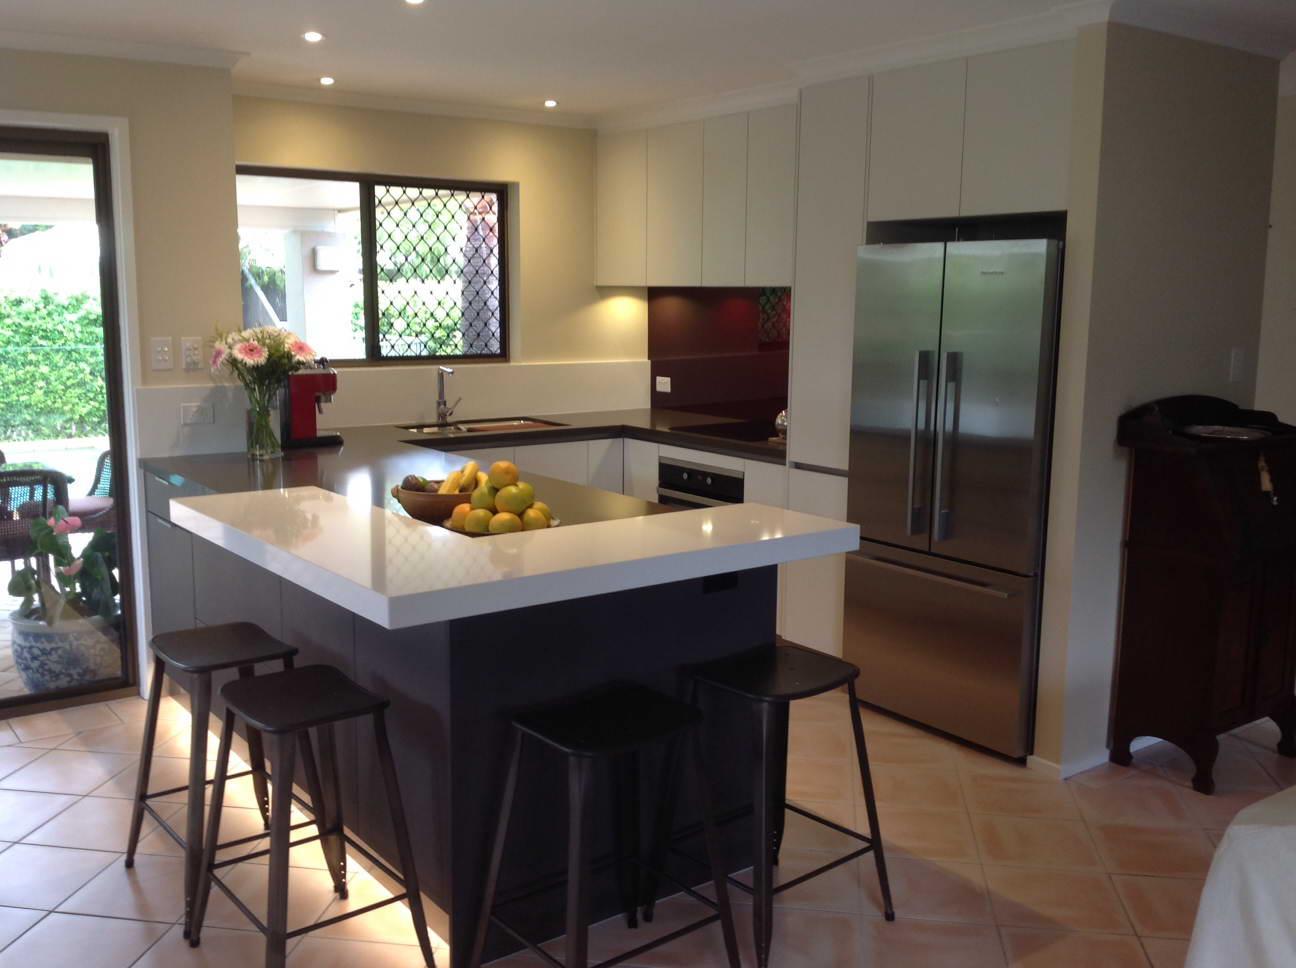 Kitchen renovations kitchen designs gold coast for Kitchen designs gold coast